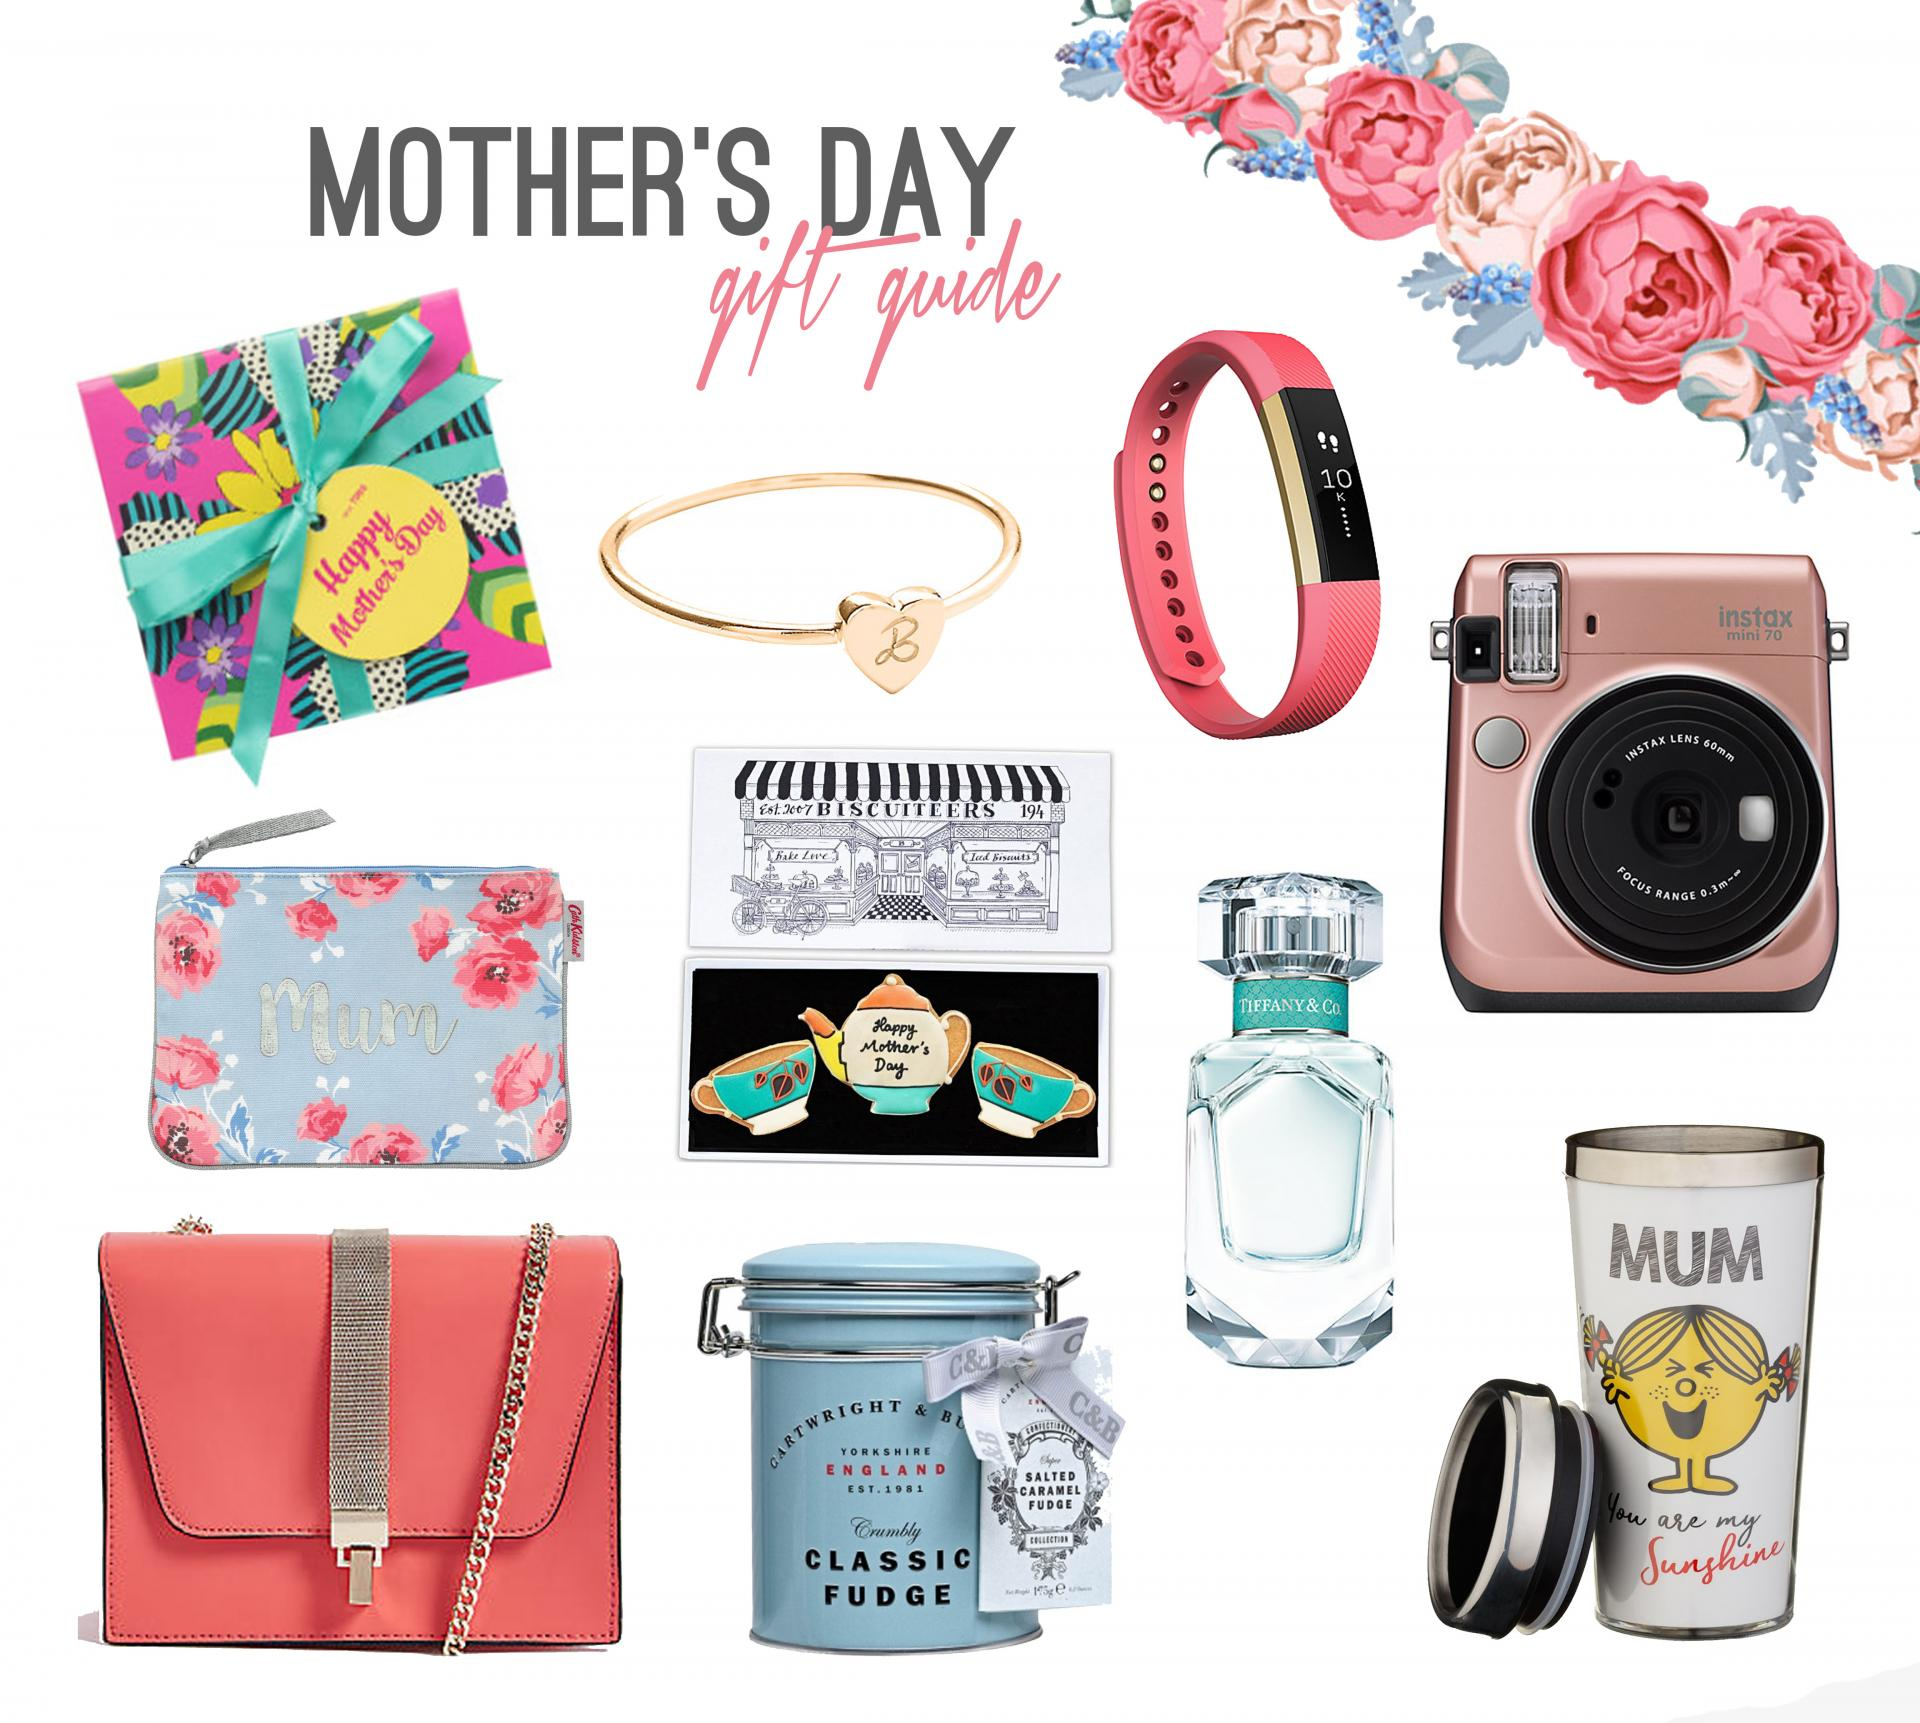 Mother's Day Gift Guide - Rachel Nicole UK Blogger